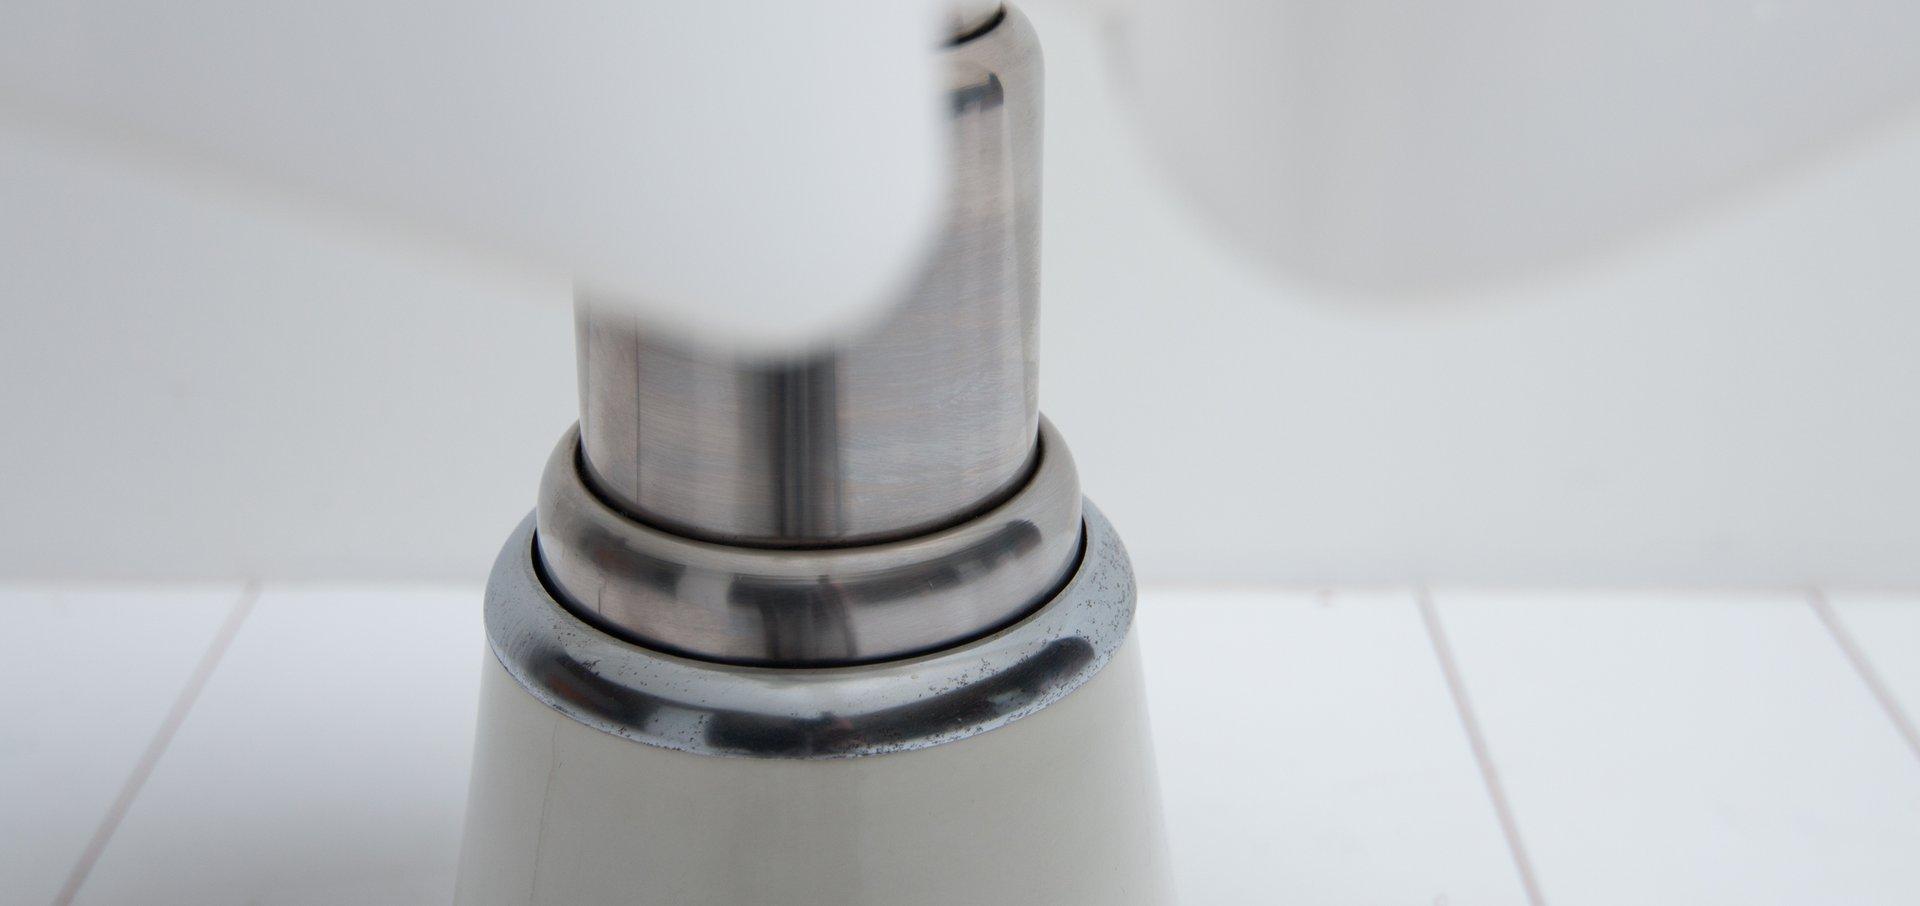 pipistrello table lamp by gae aulenti for martinelli luce. Black Bedroom Furniture Sets. Home Design Ideas